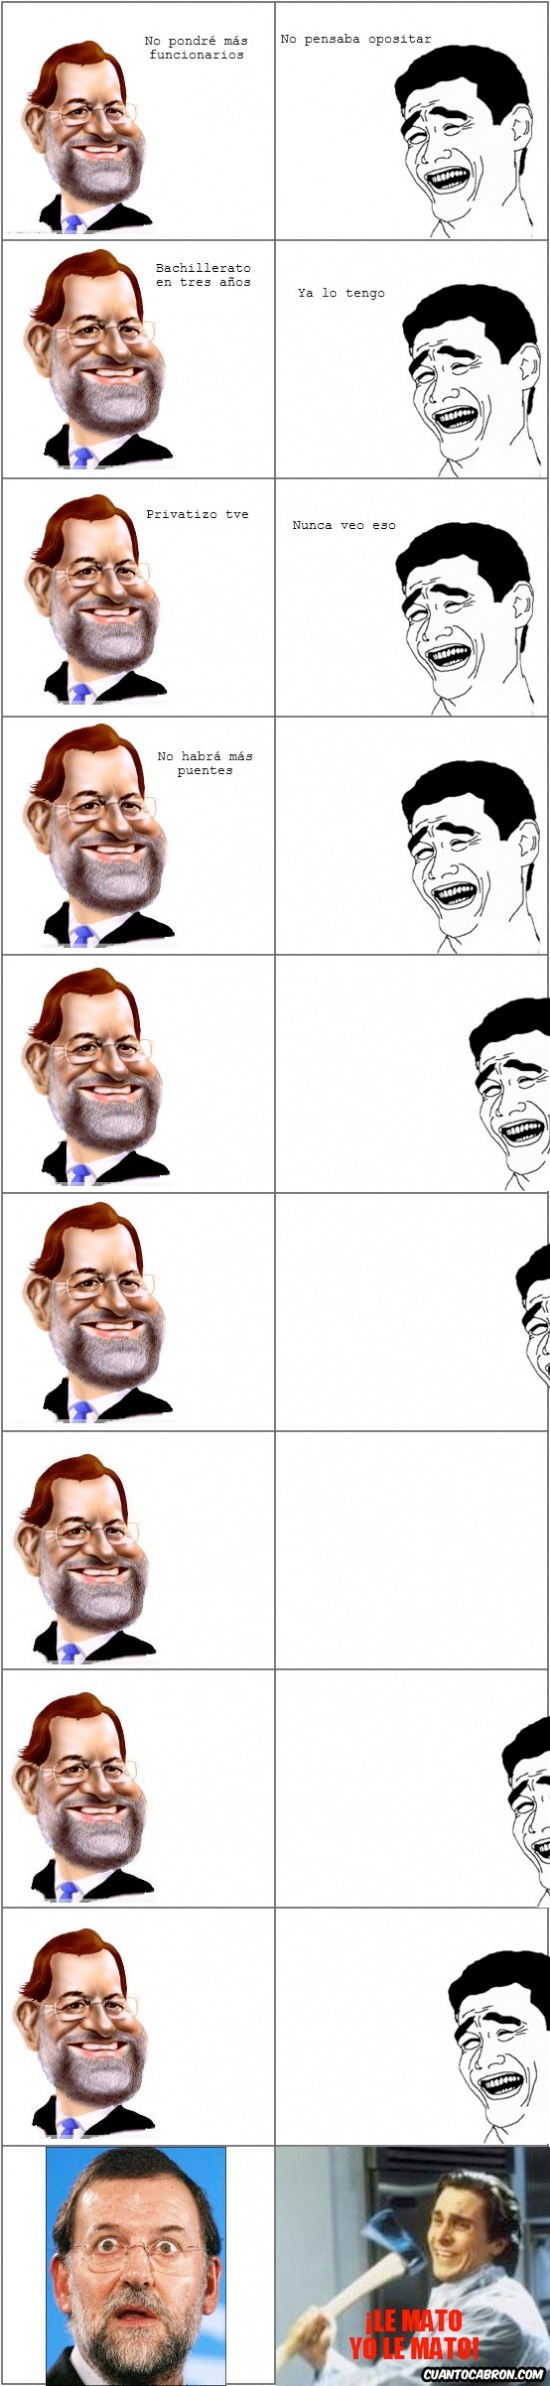 Pat_bateman - Rajar a Rajoy